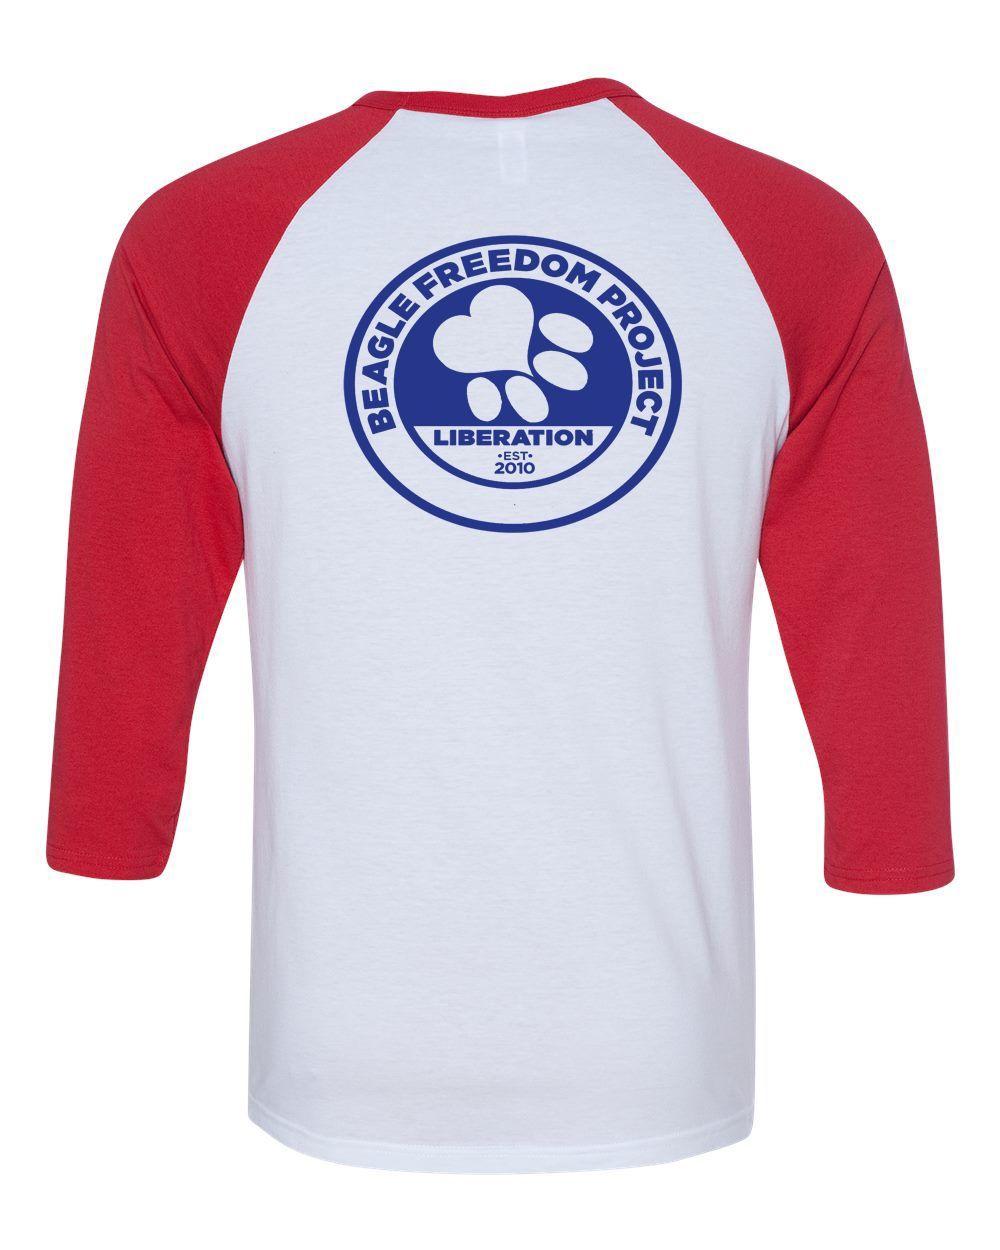 Beagle Freedom Project FTLA Apparel Unisex Red Sleeves Baseball Tee Life Love Liberty